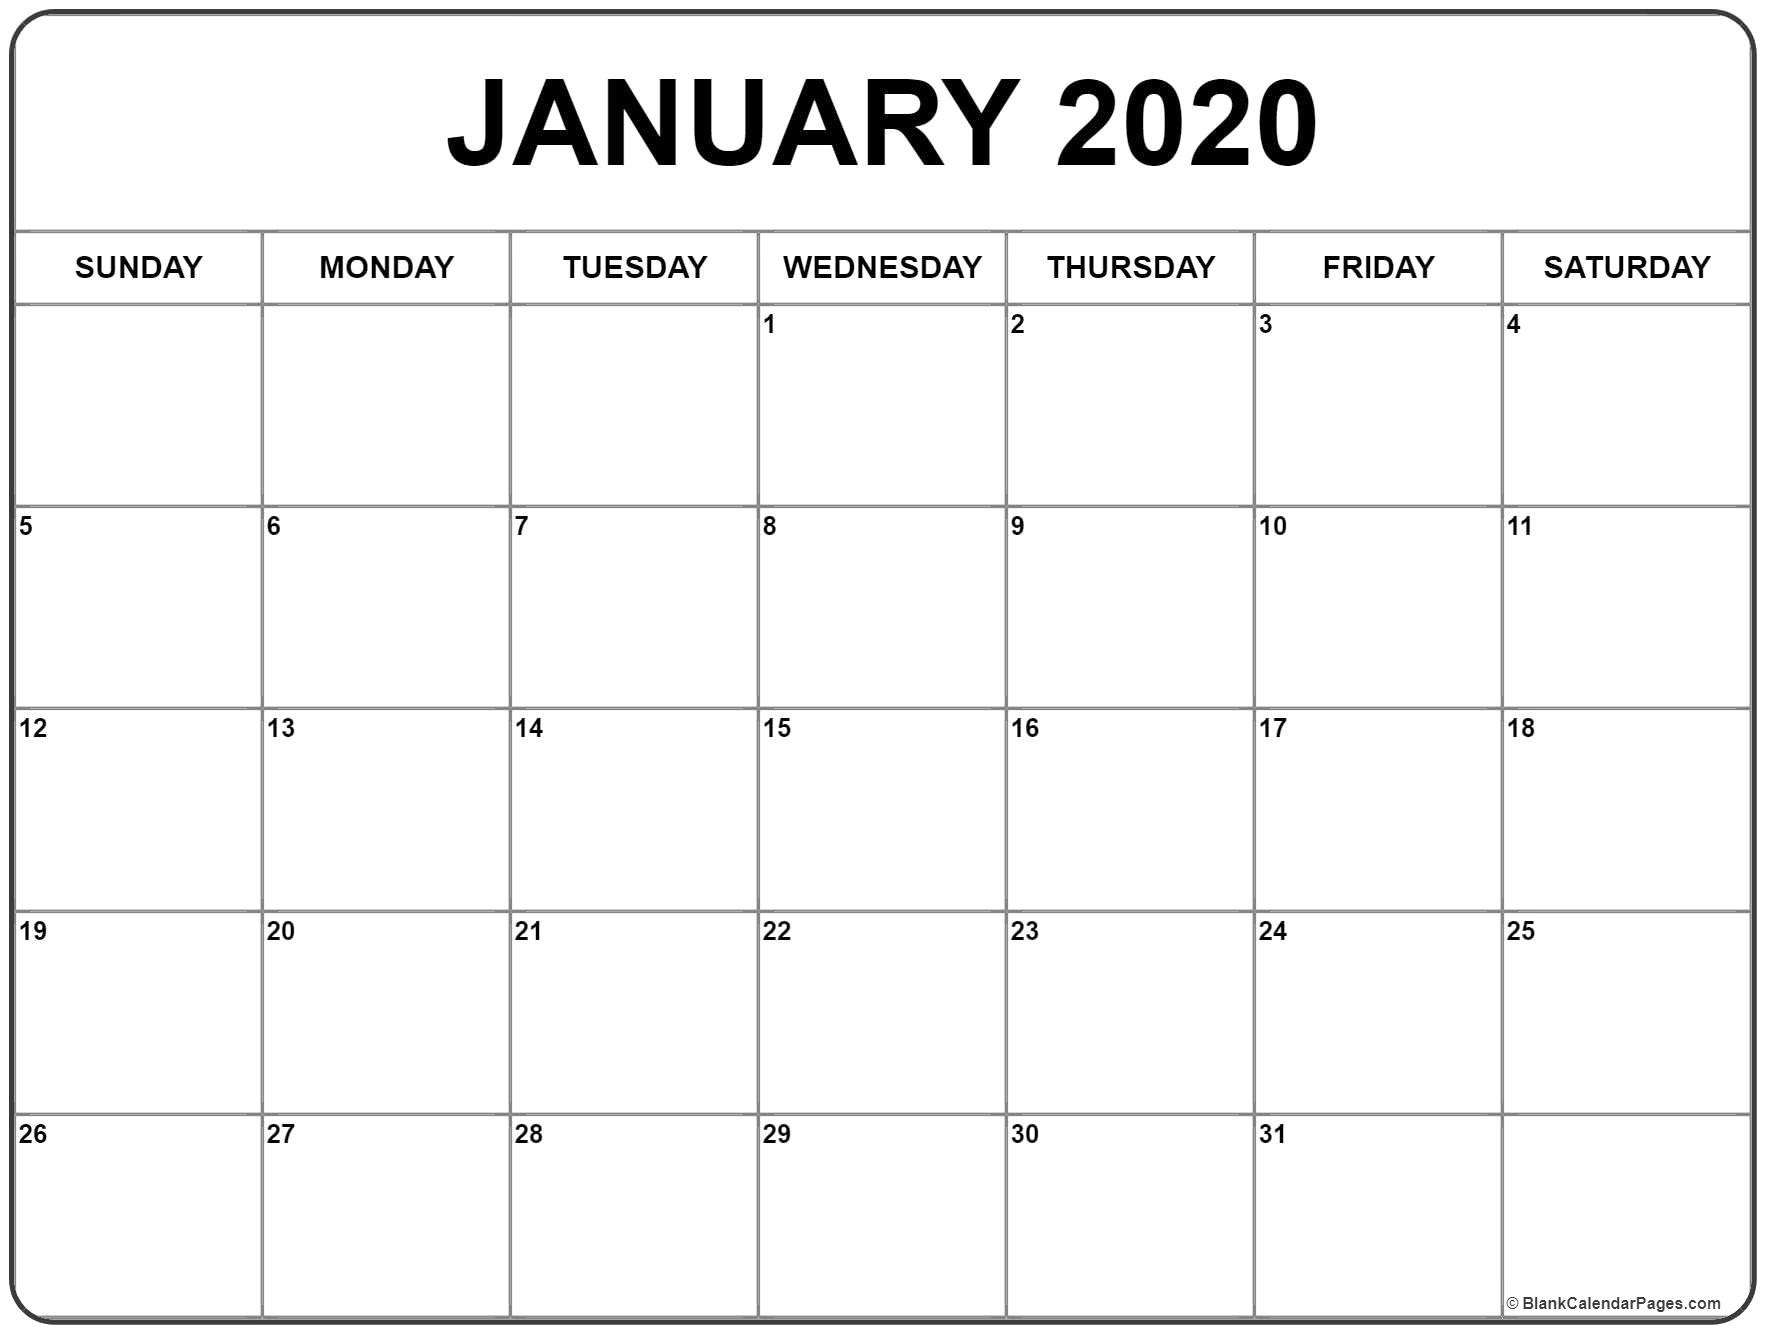 January 2020 Calendar B2 | Jcreview-January 2020 Calendar Australia